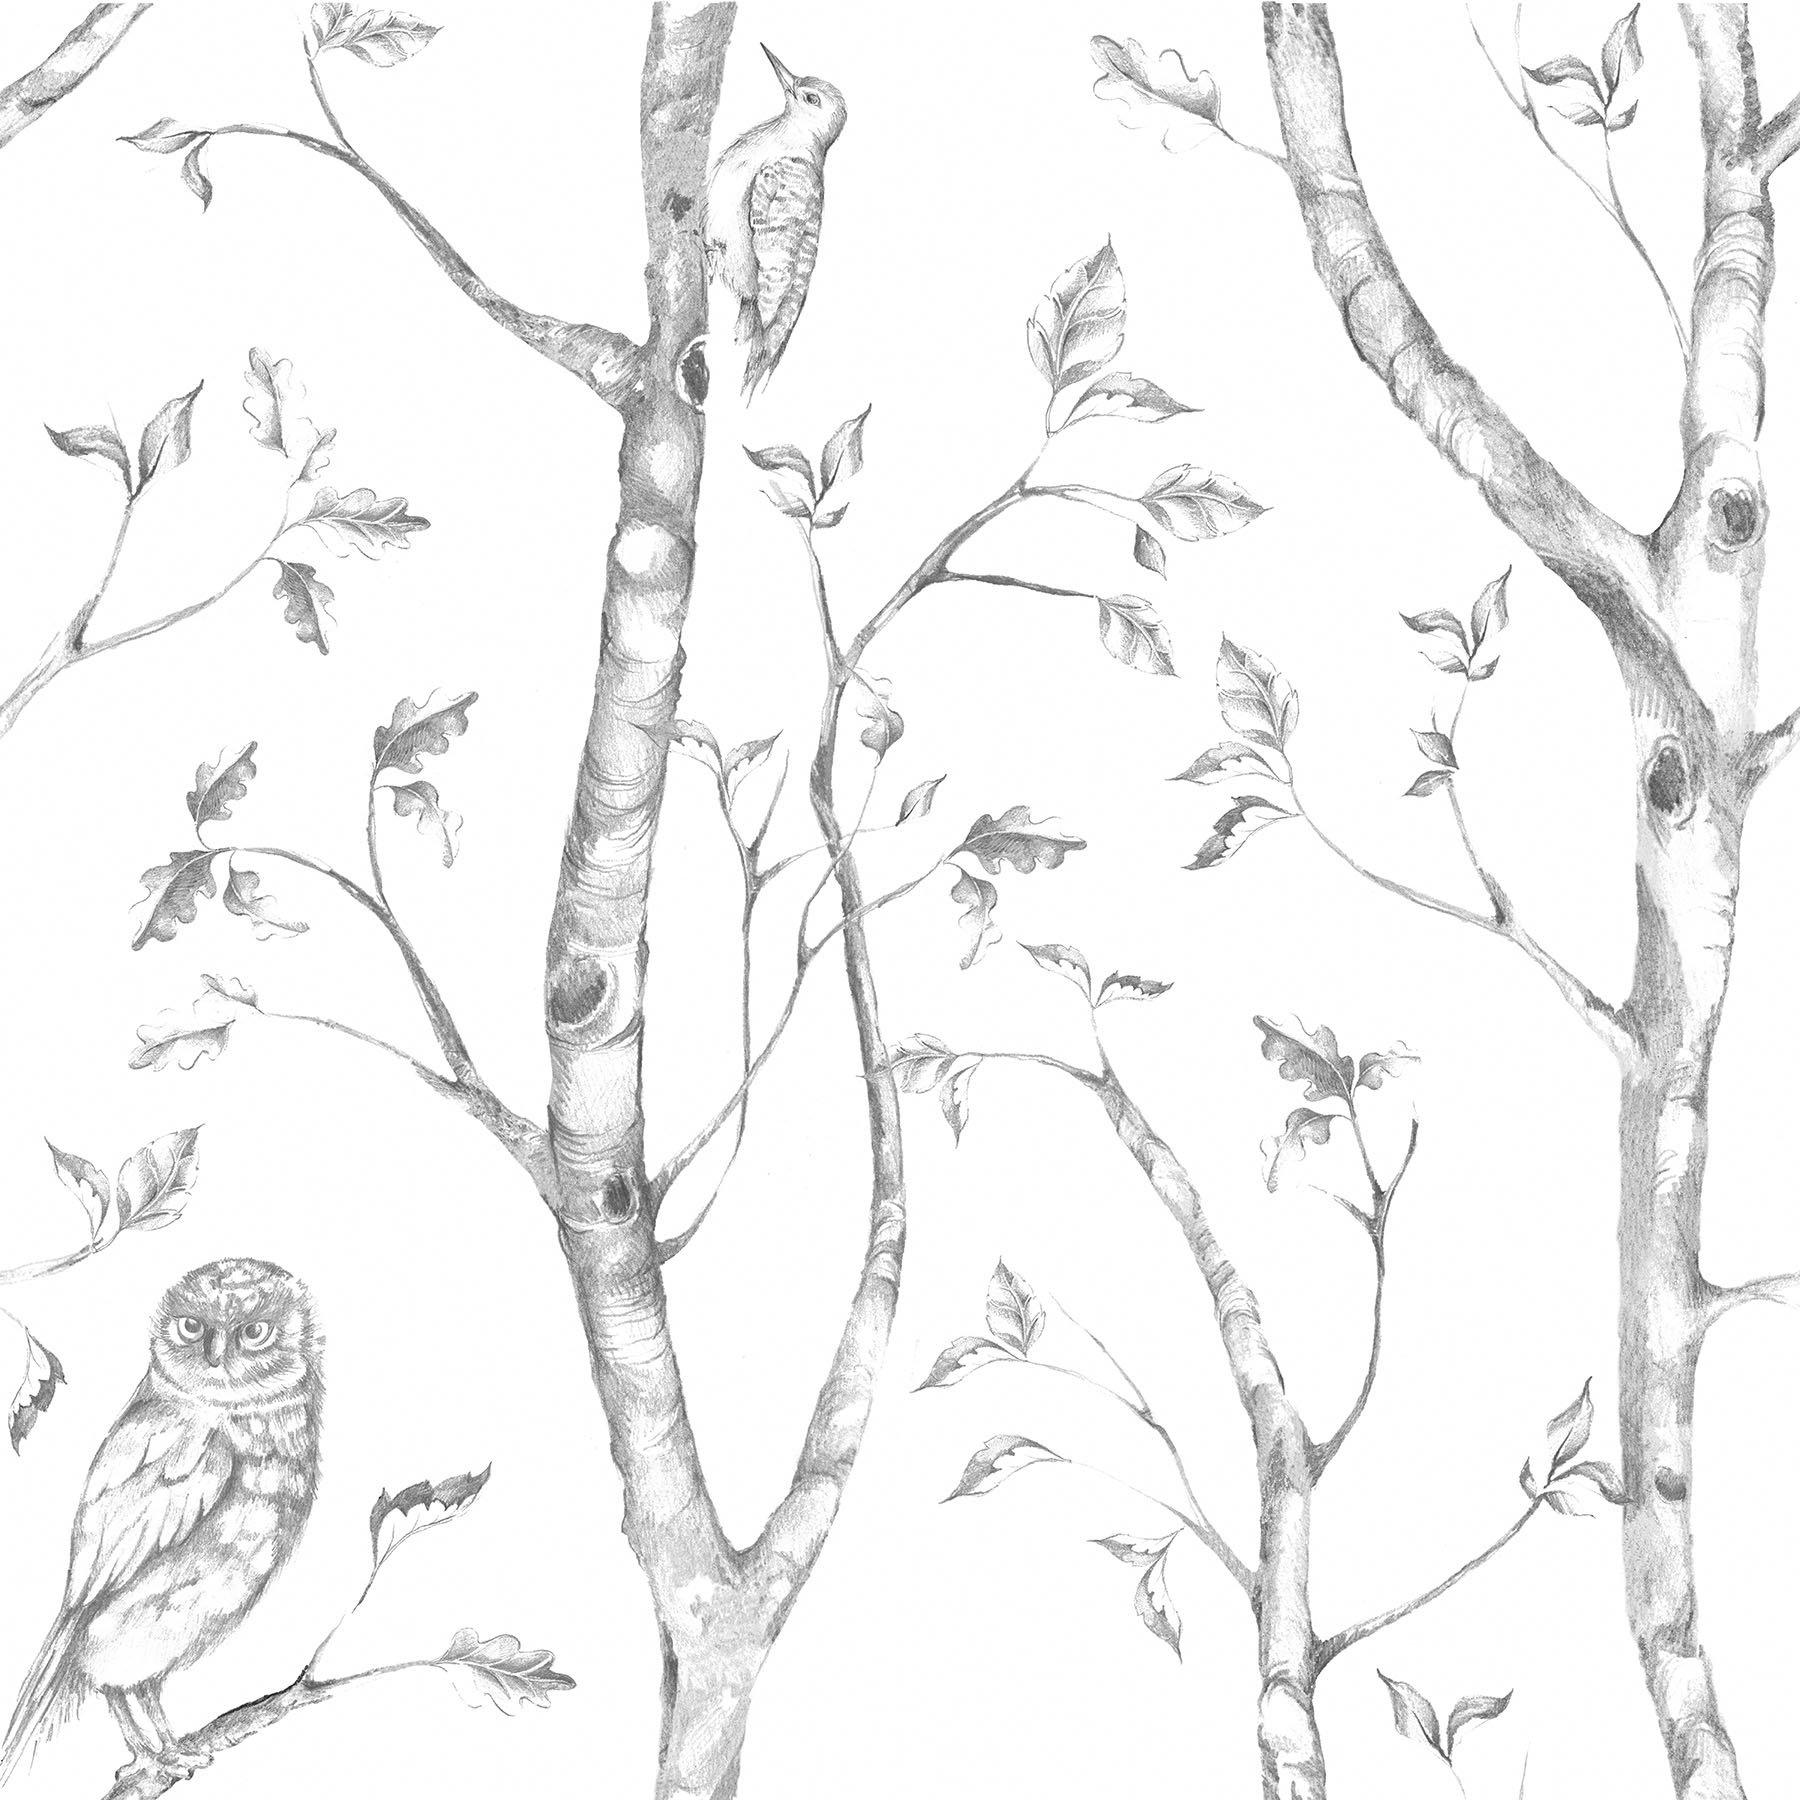 NuWallpaper Wall Pops NU1412 Gray Woods Peel and Stick Peel & Stick Wallpaper by NuWallpaper